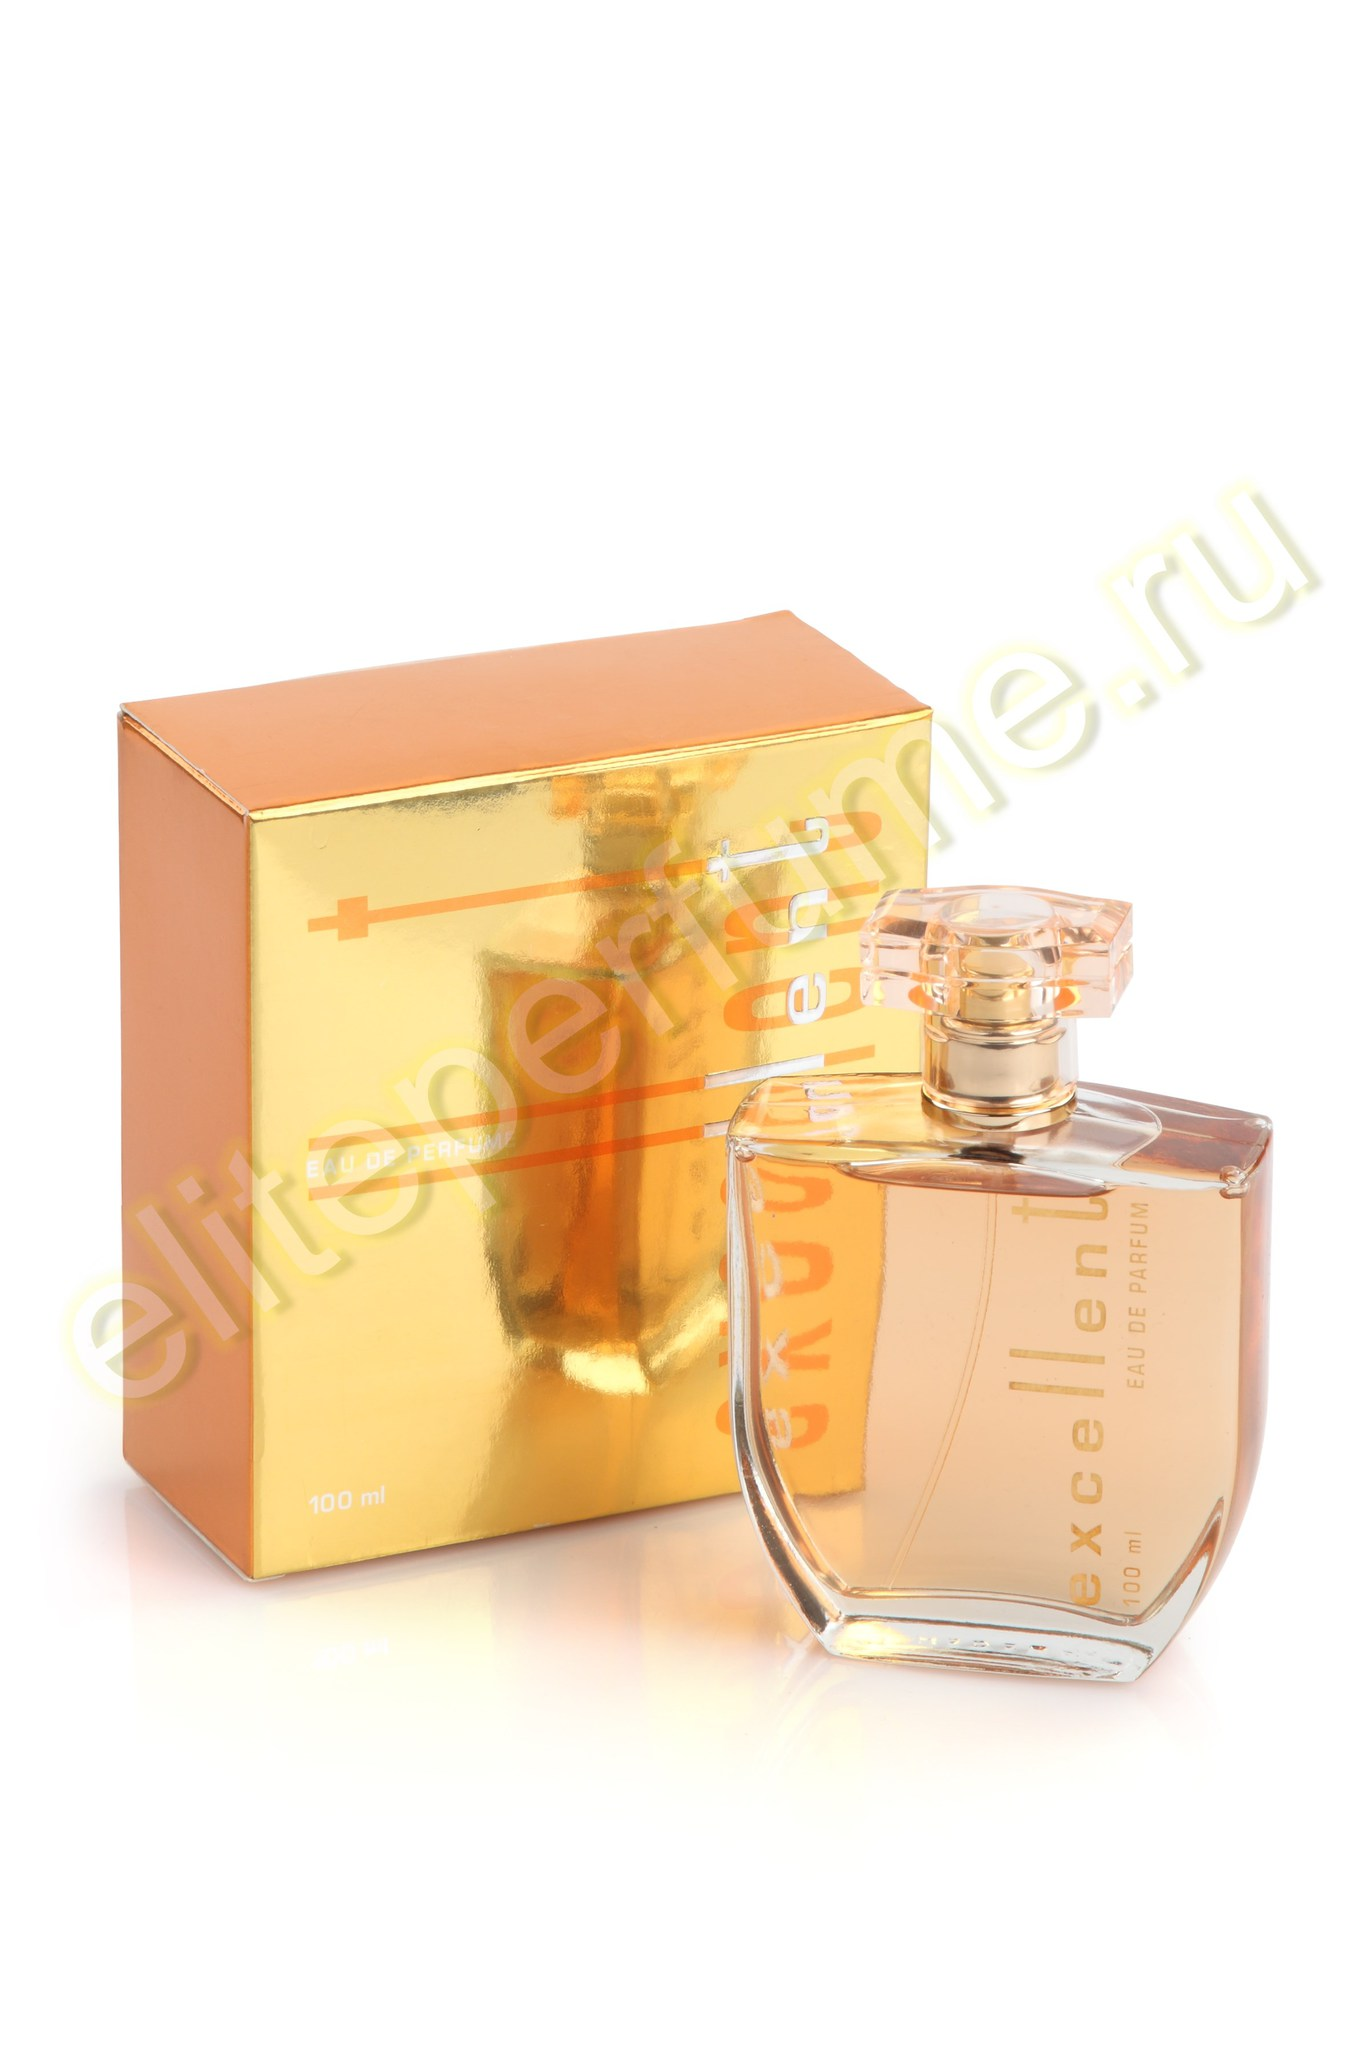 Excellent Великолепие спрей 100 мл женский спрей от Аль Харамайн Al Haramain Perfumes